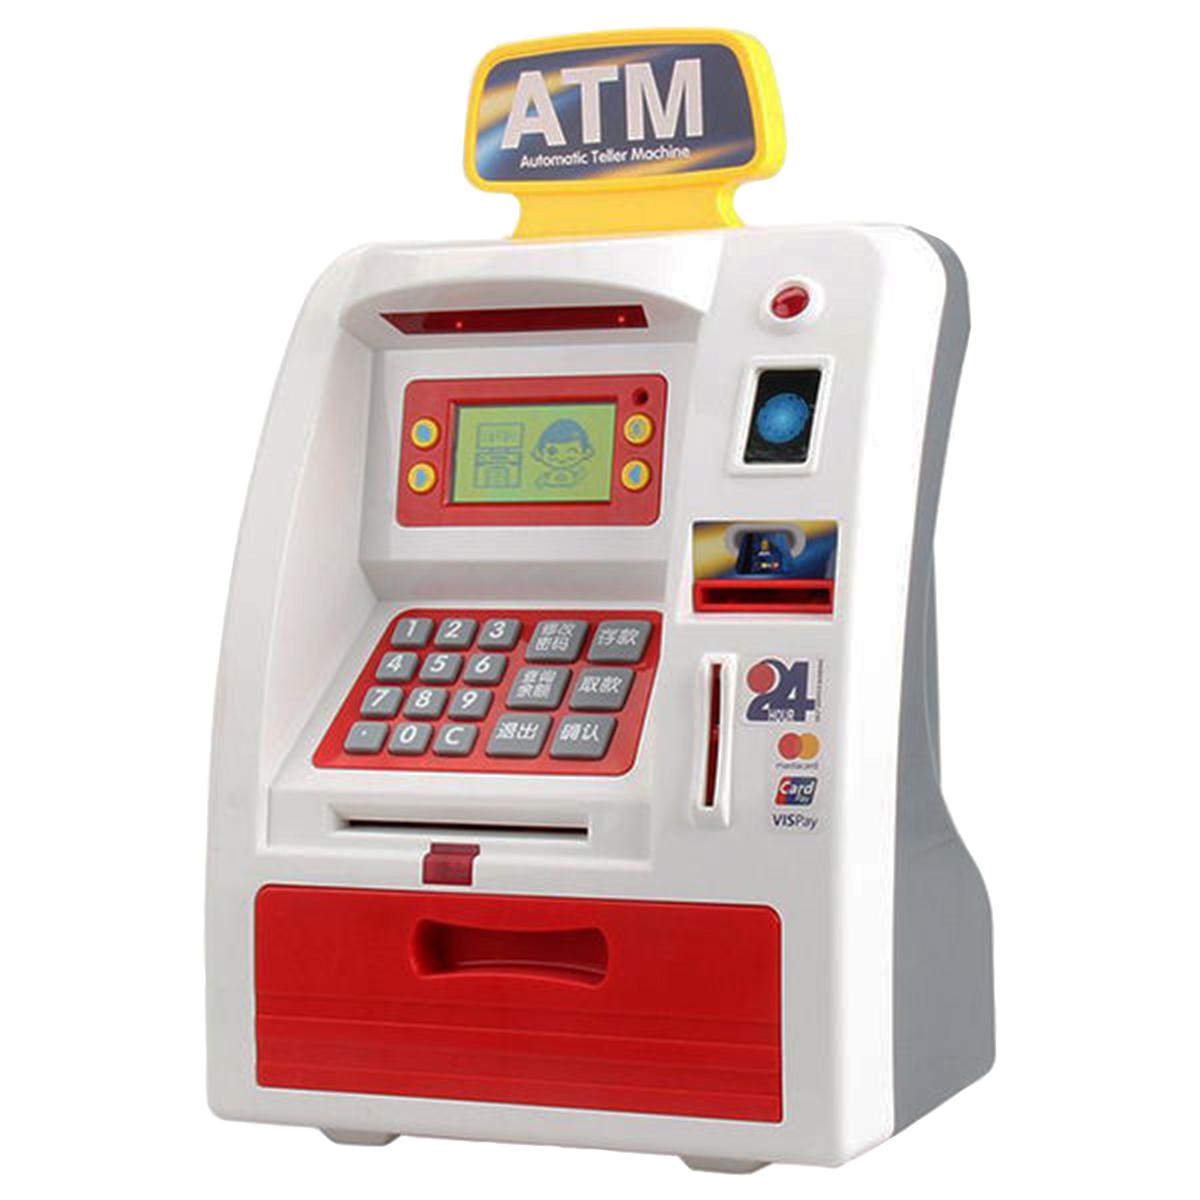 اسباب بازی عابربانک مدل Five Star ATM